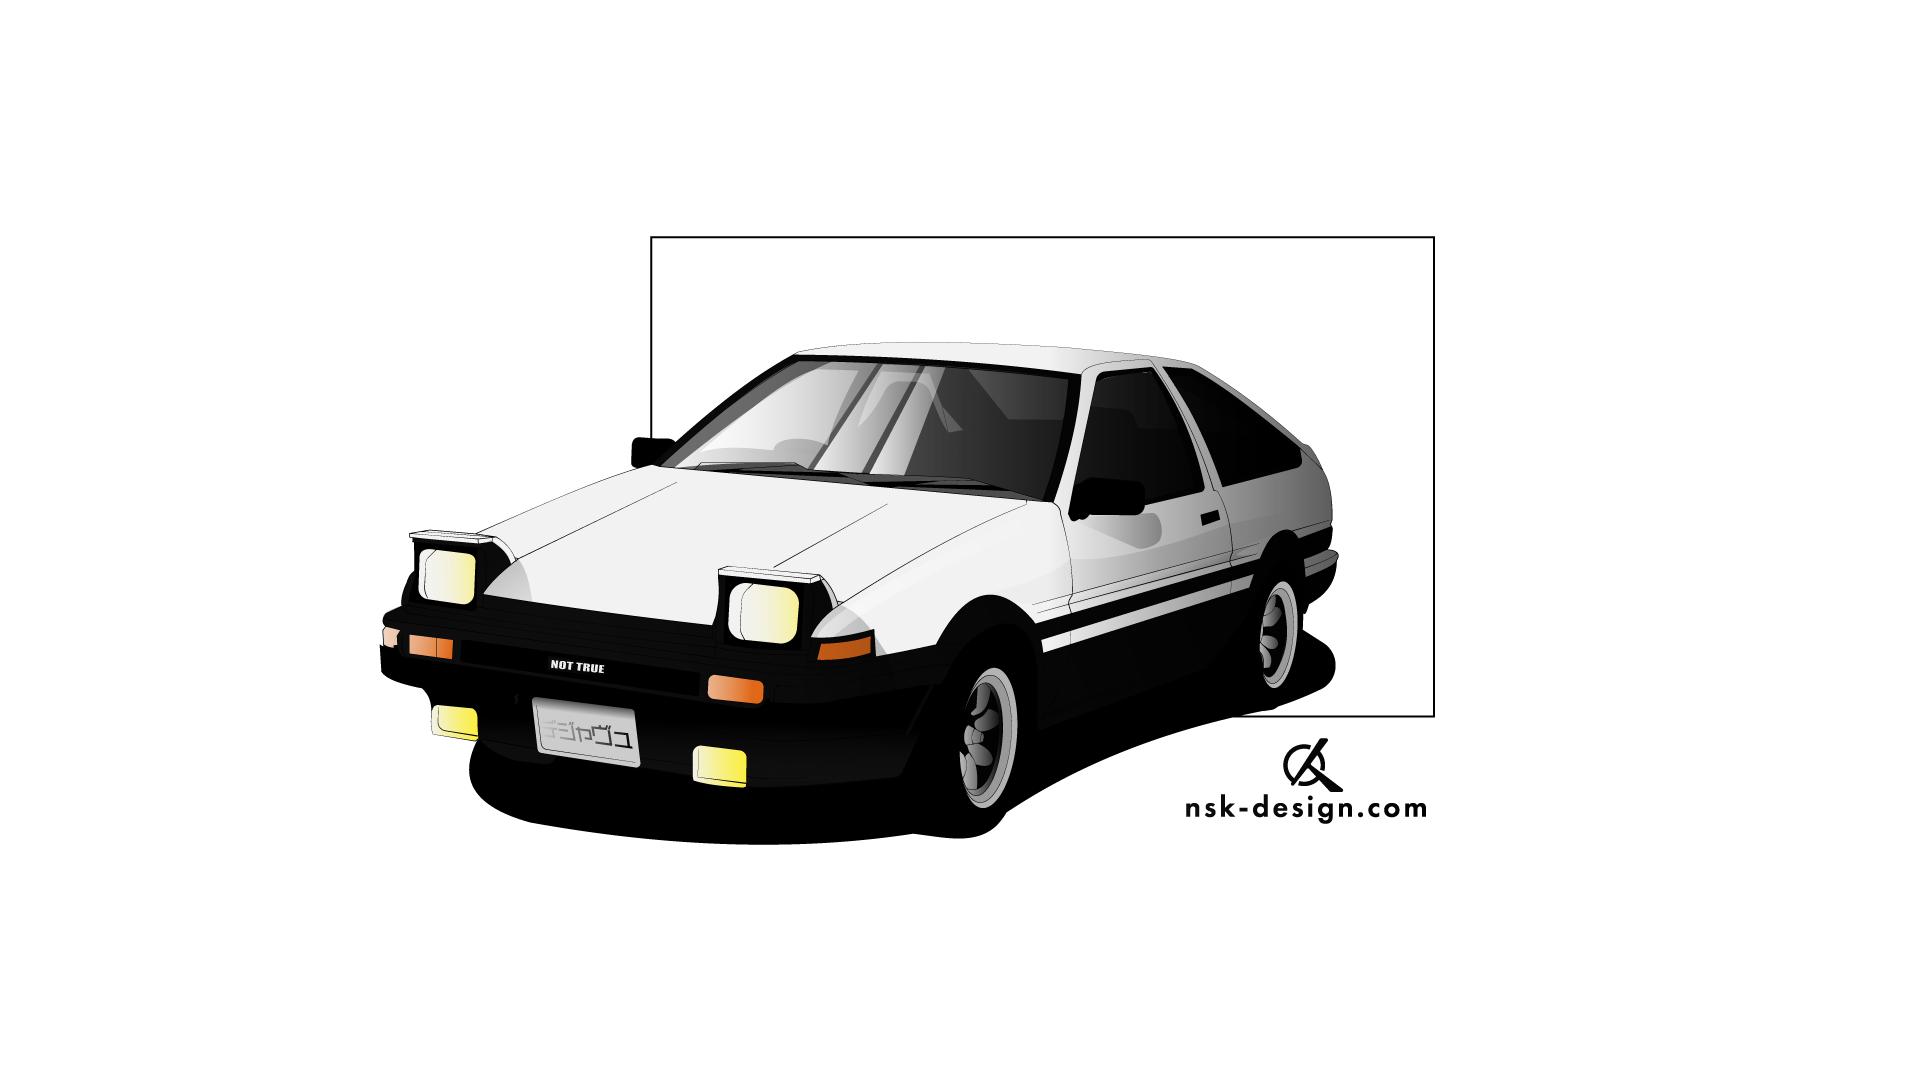 Hachi roku toyota ae86 toyota jdm japanese cars japan drift drifting ae86 trueno